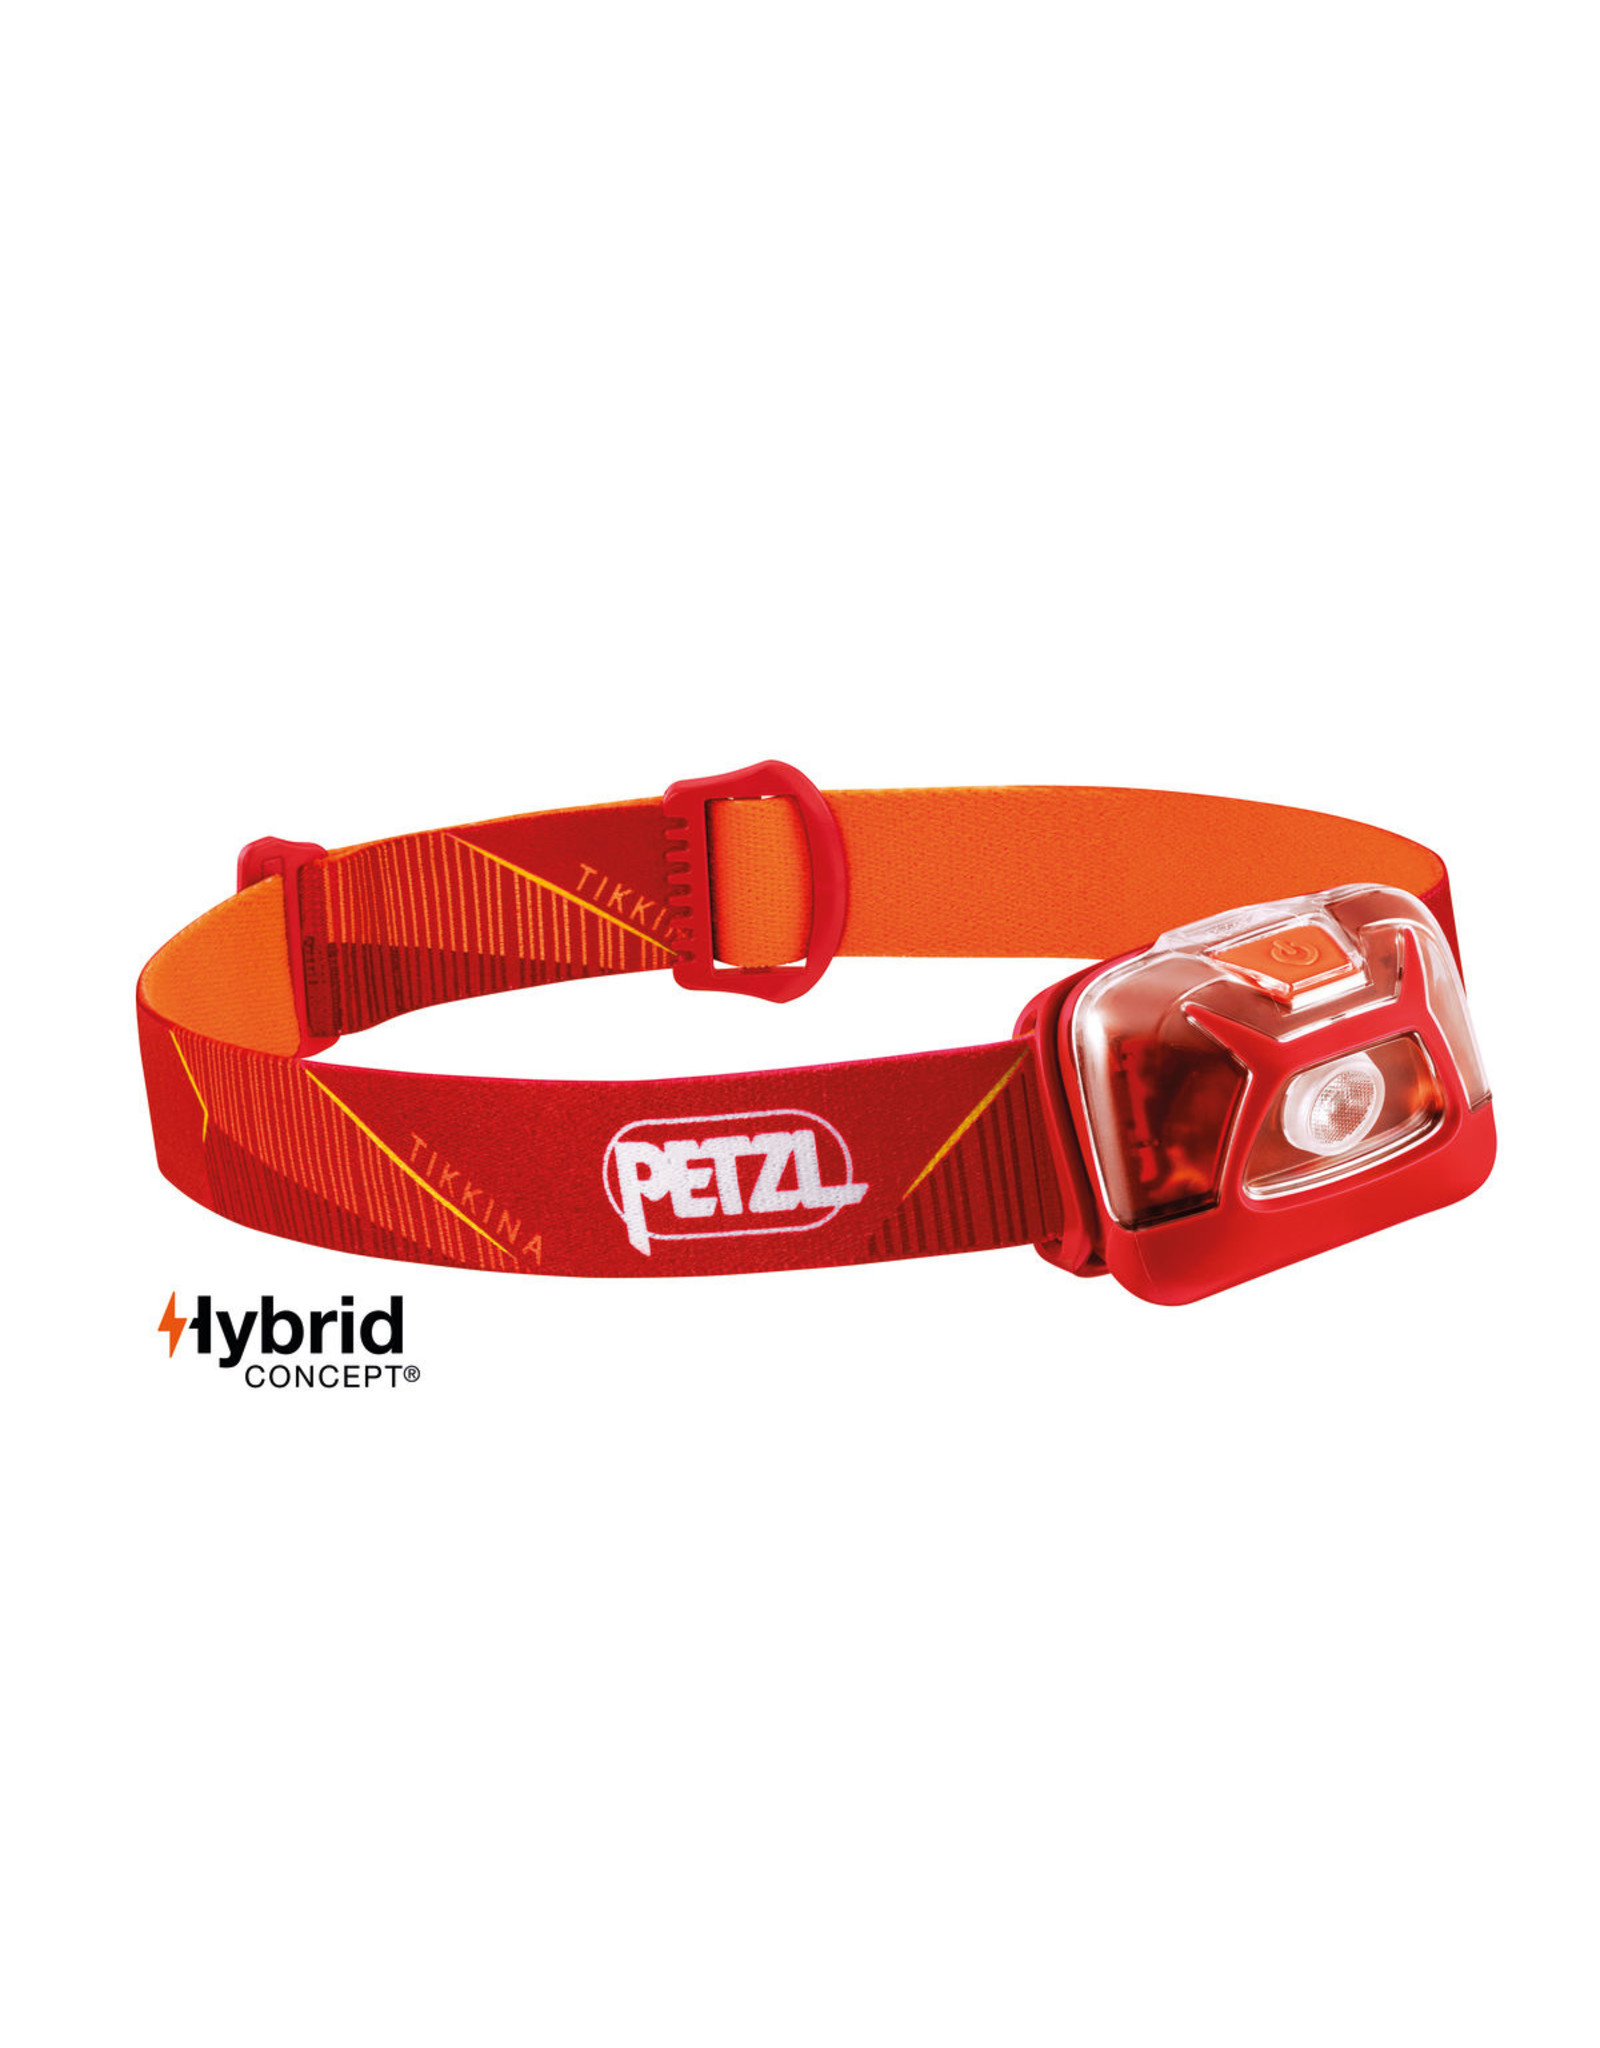 PETZL TIKKINA 250 lumens, standard lighting red -